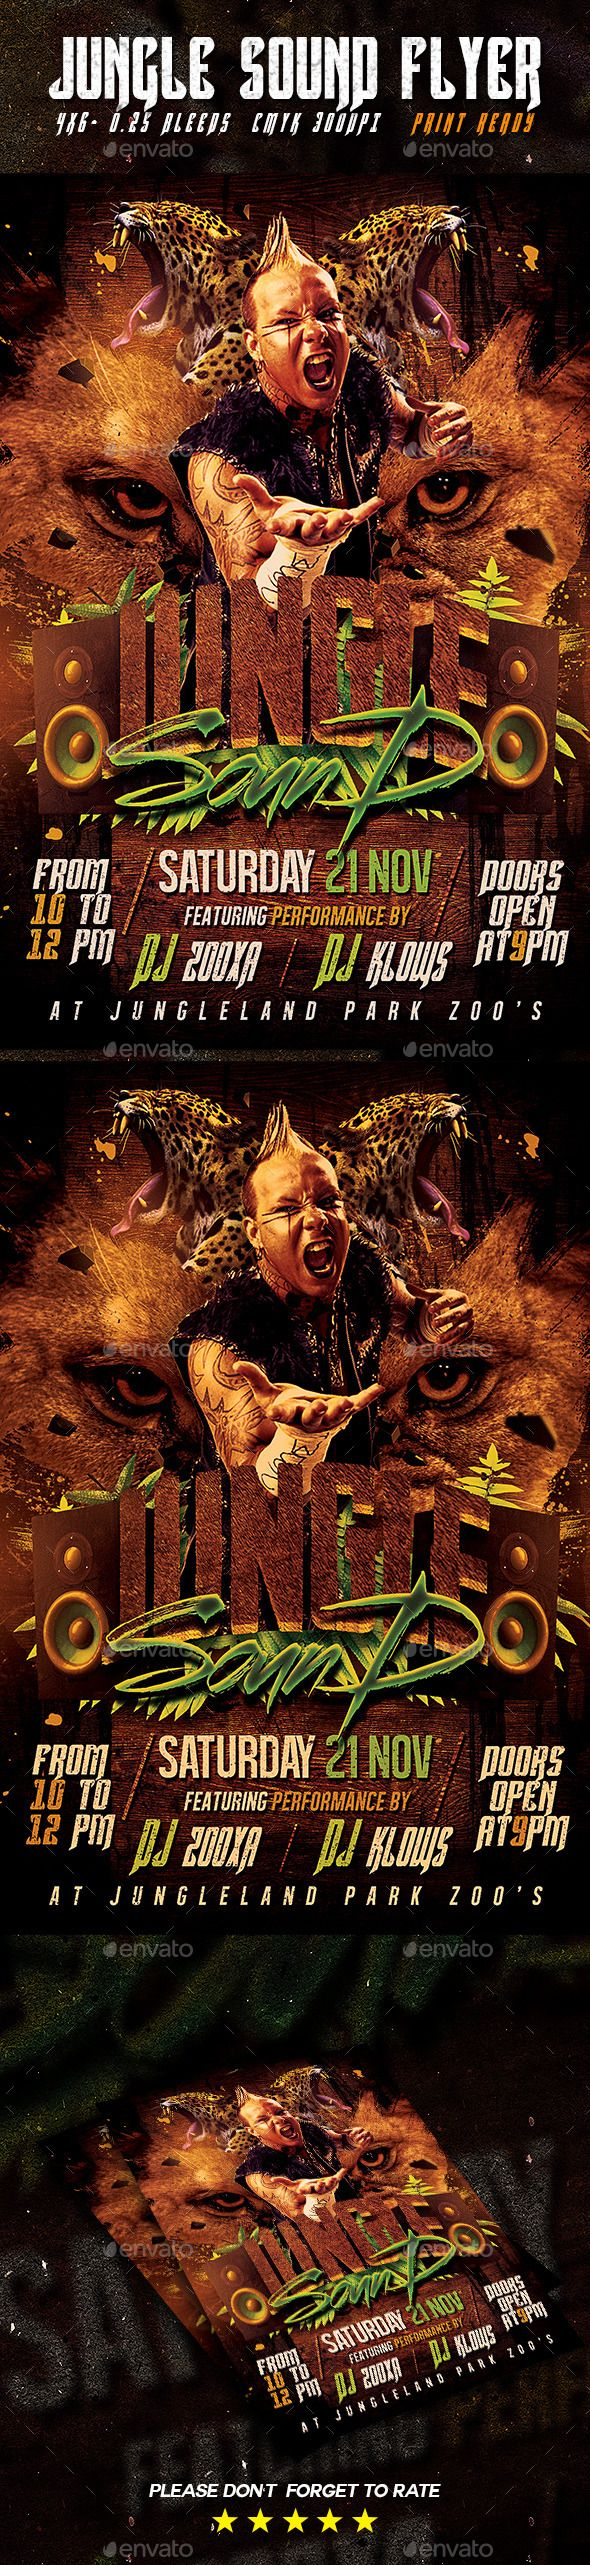 Jungle Sound Flyer